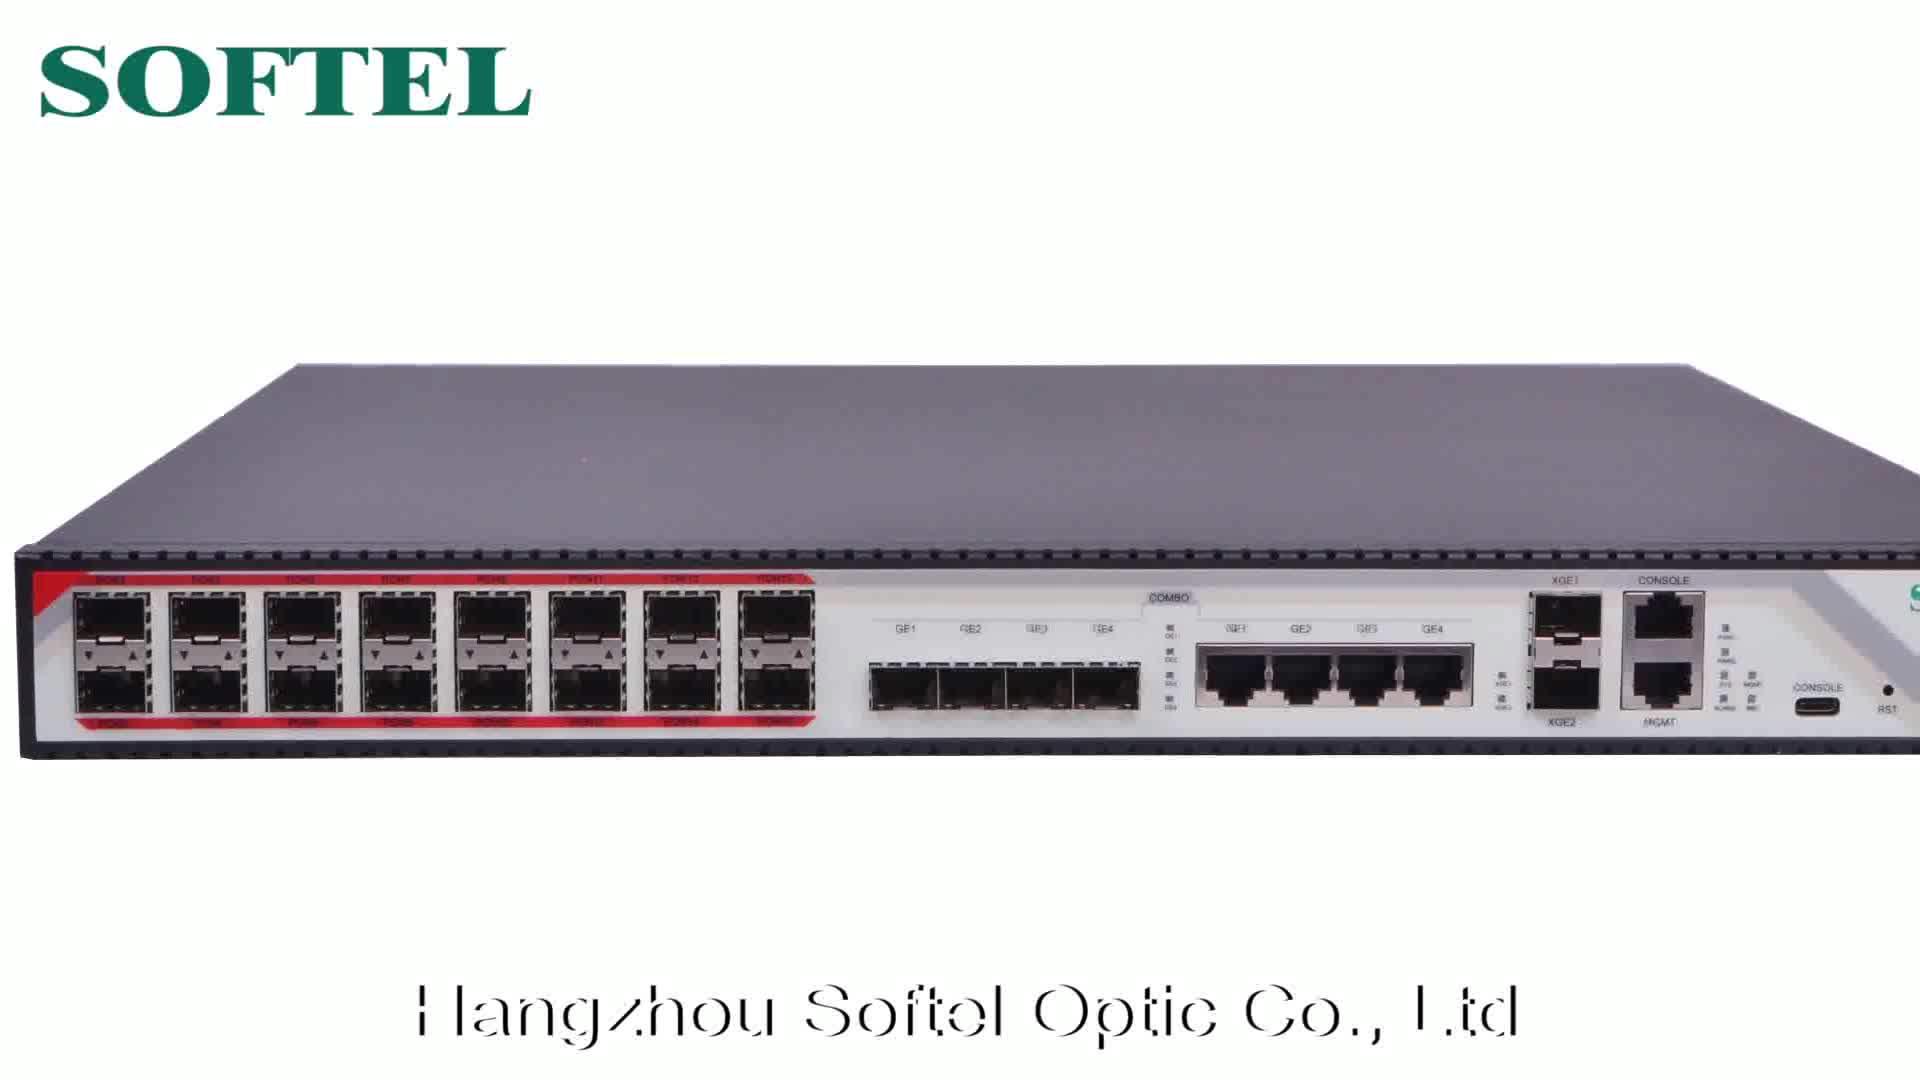 Fiber Optic 16 PON GPON OLT with 2.5G module for FTTx Solution